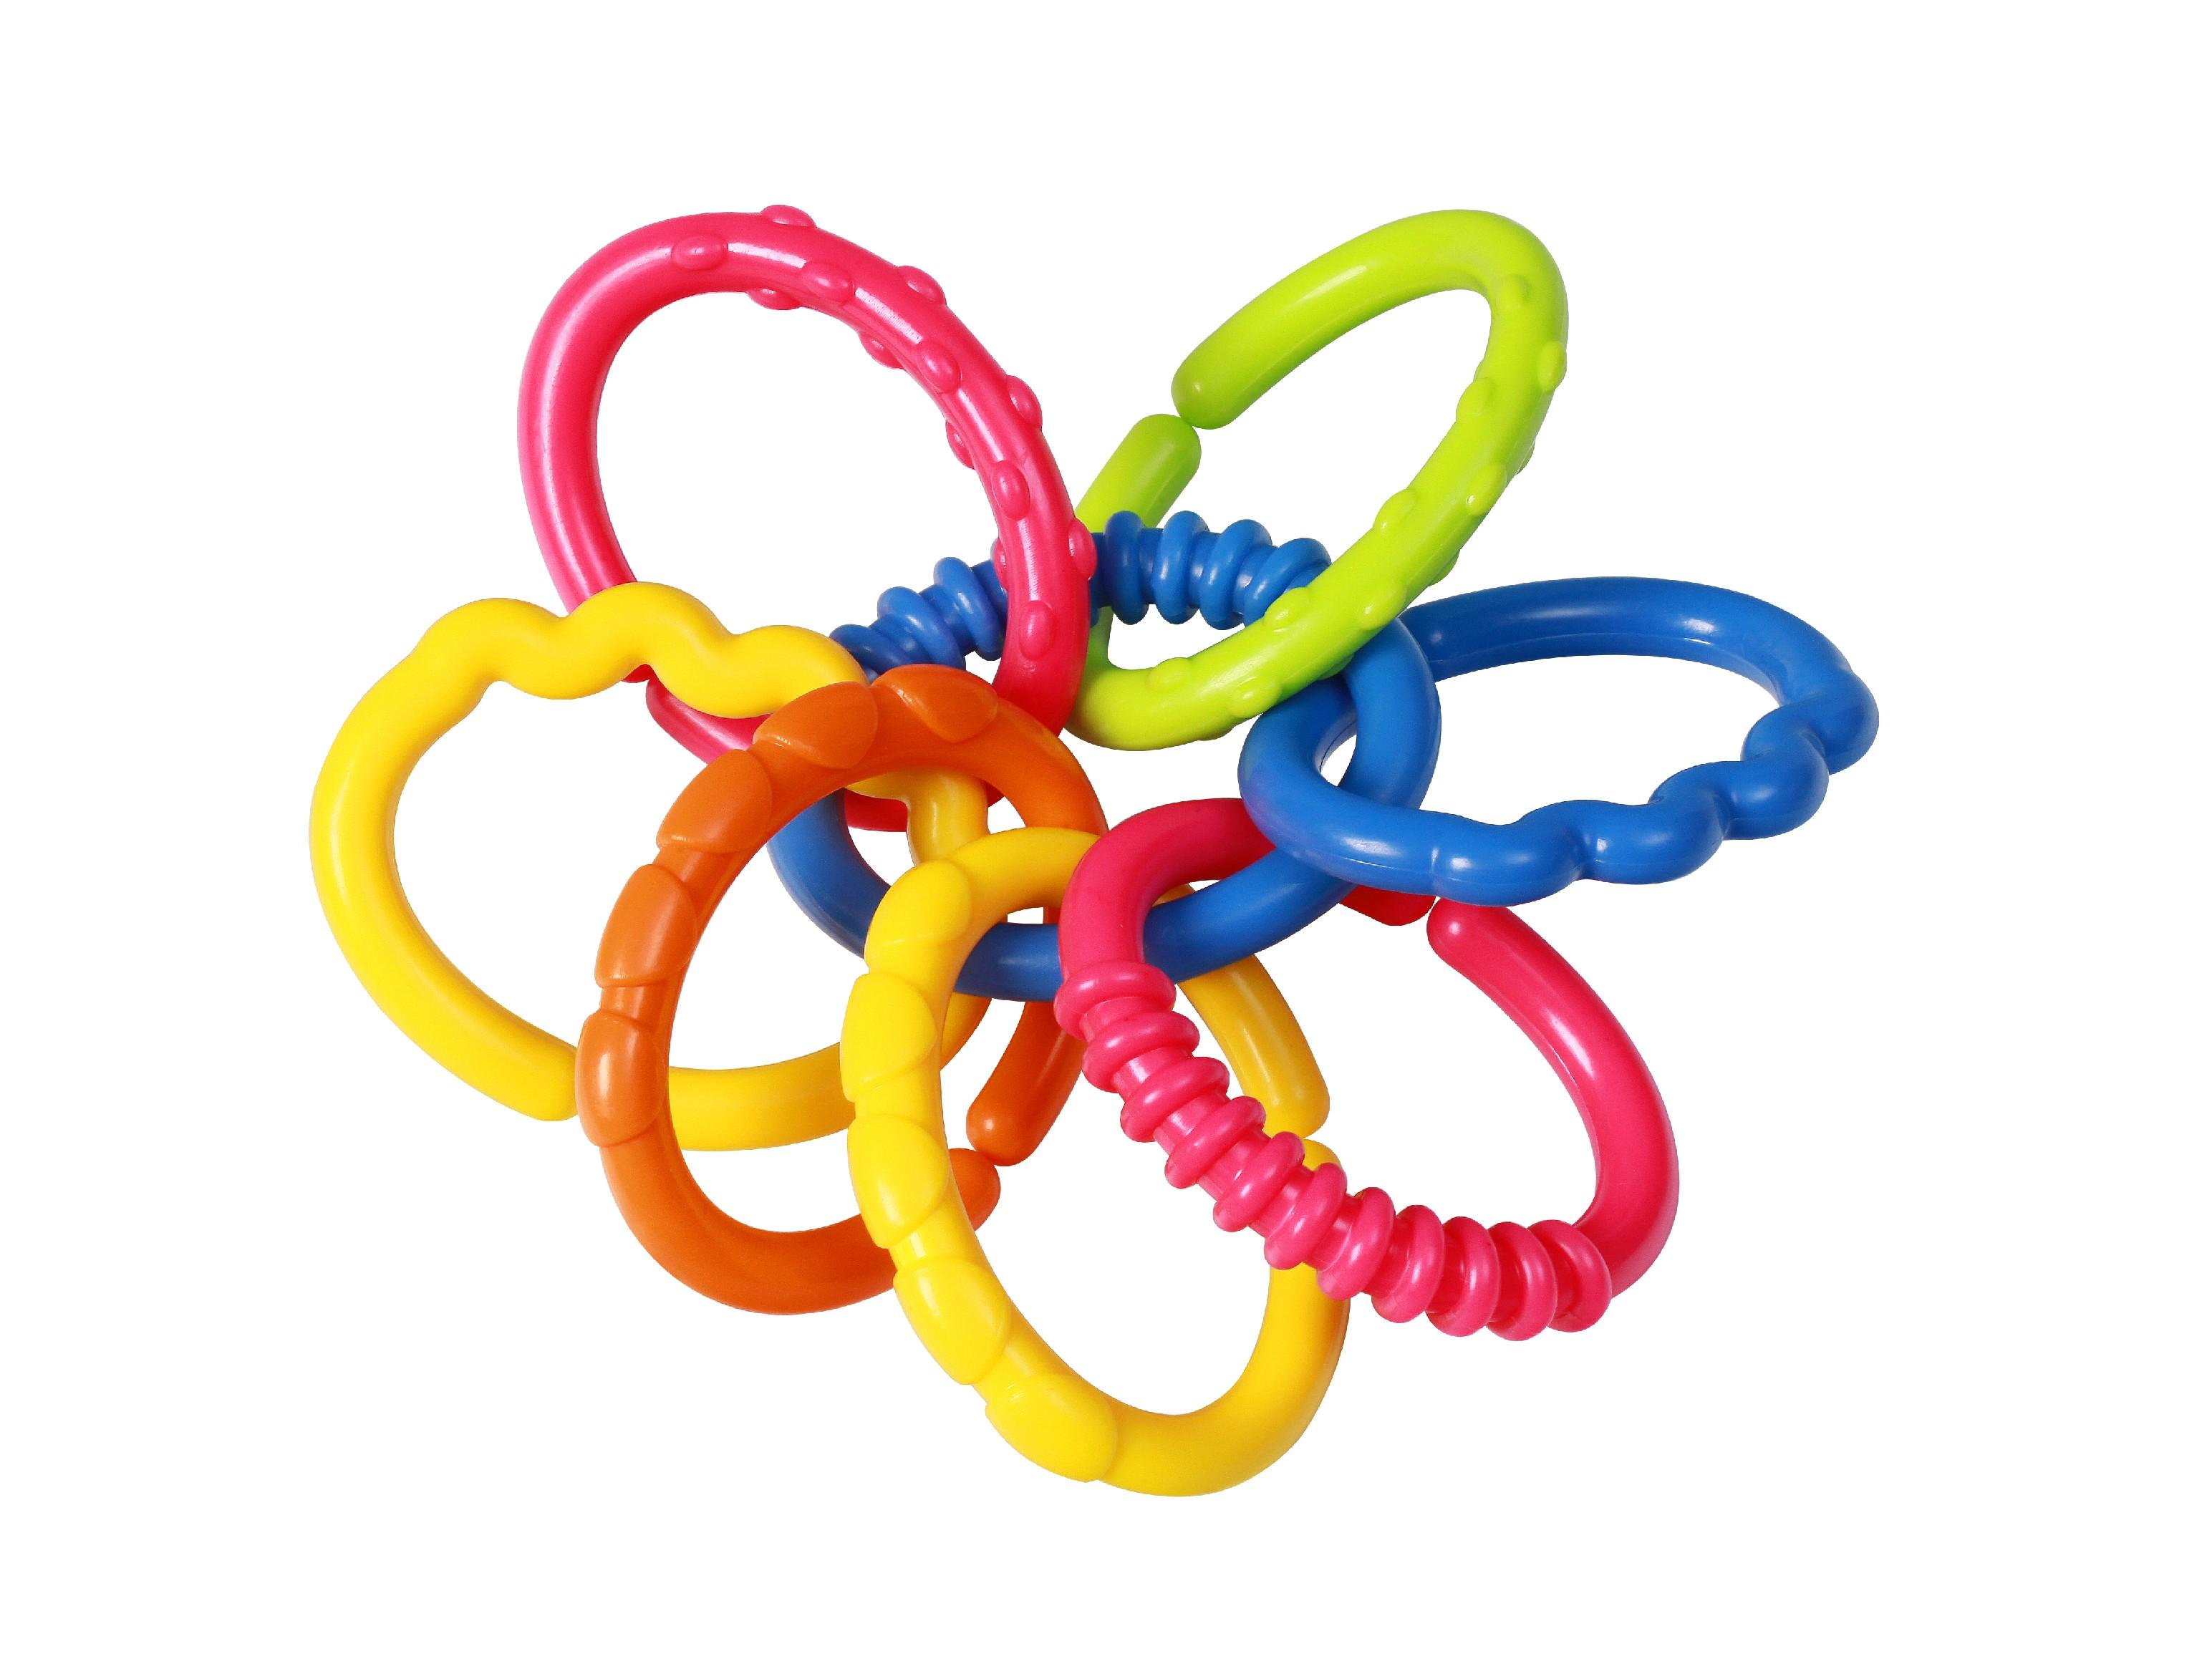 BabyOno Kousátko barevné kroužky 3m+